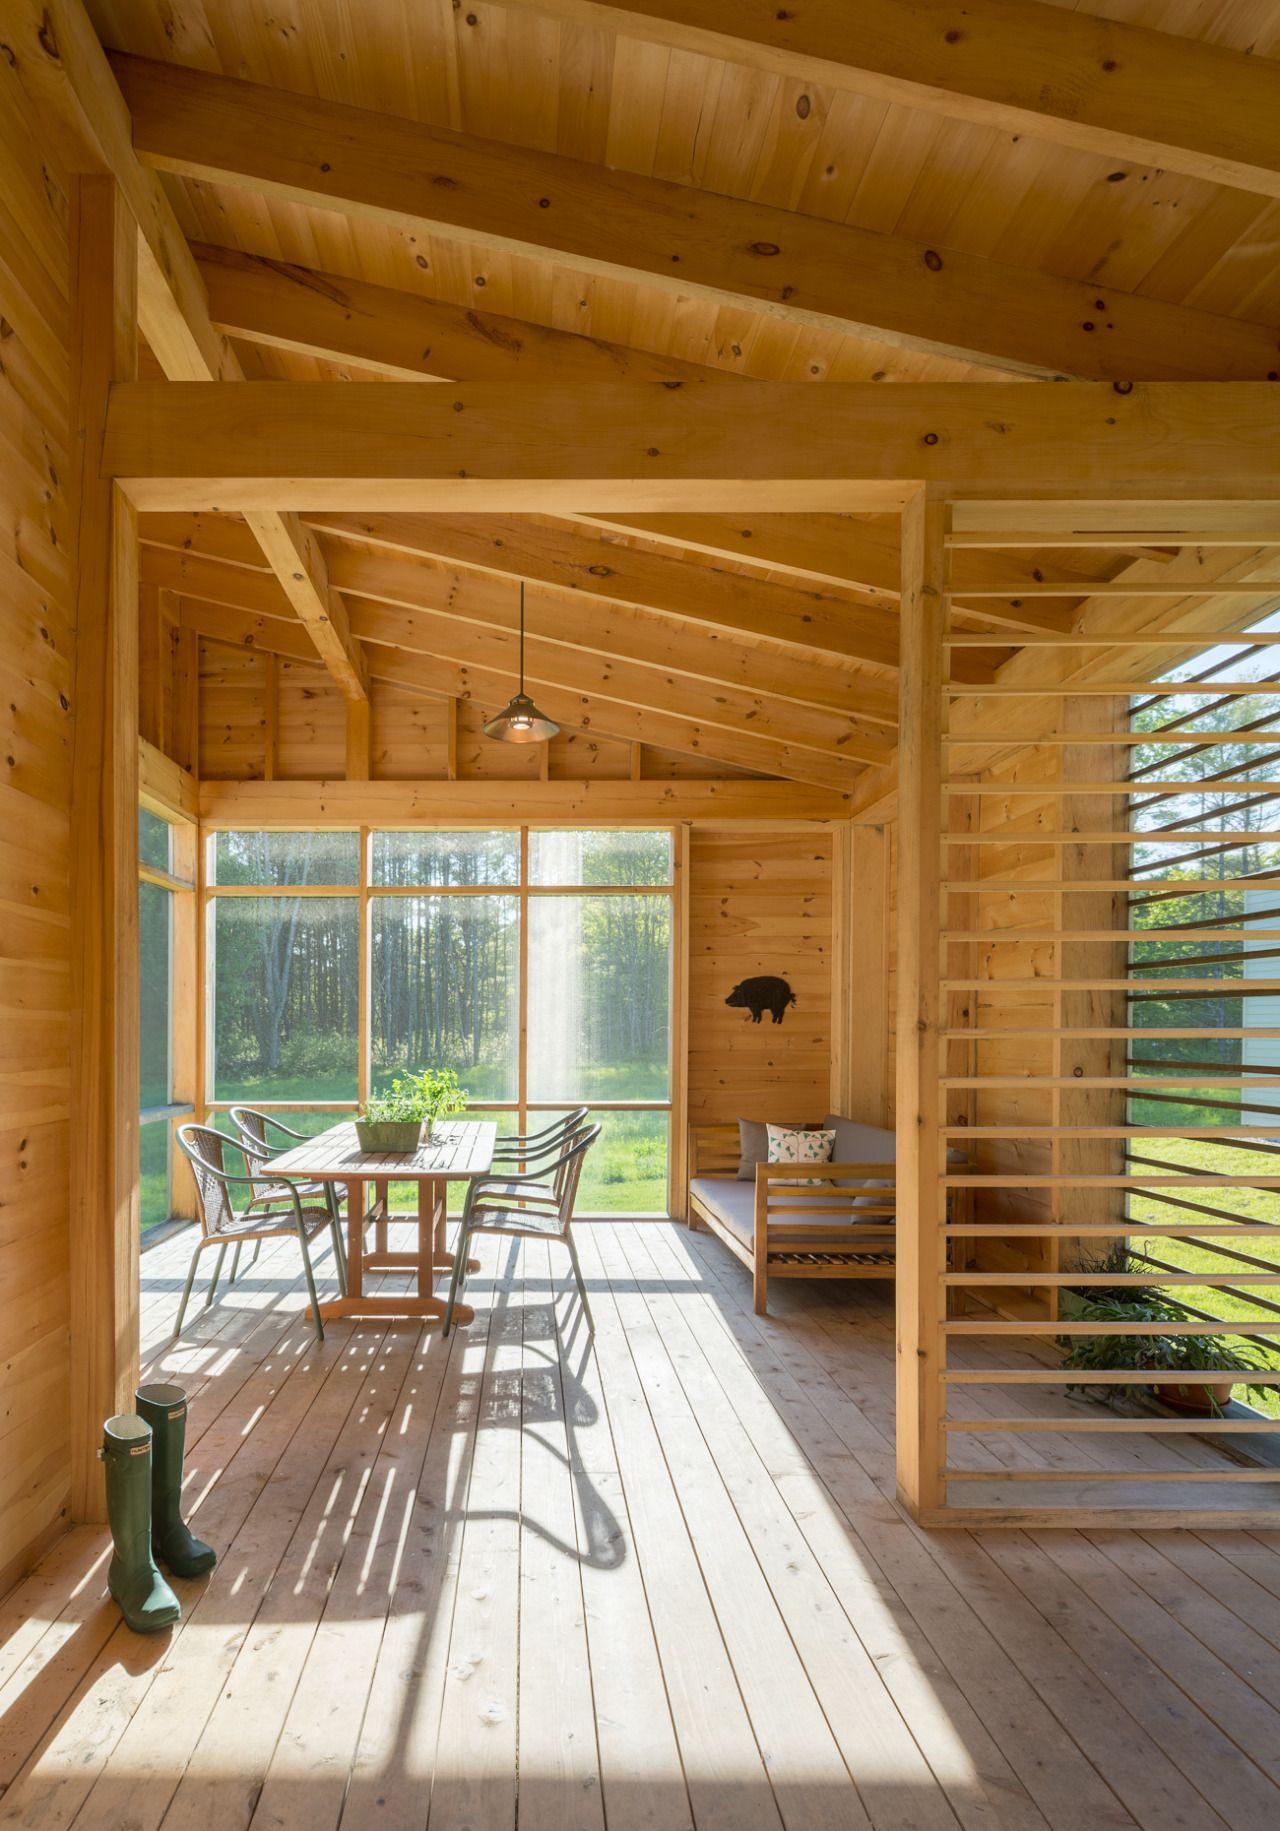 Remash Building A Wooden House Wooden House Design House Design